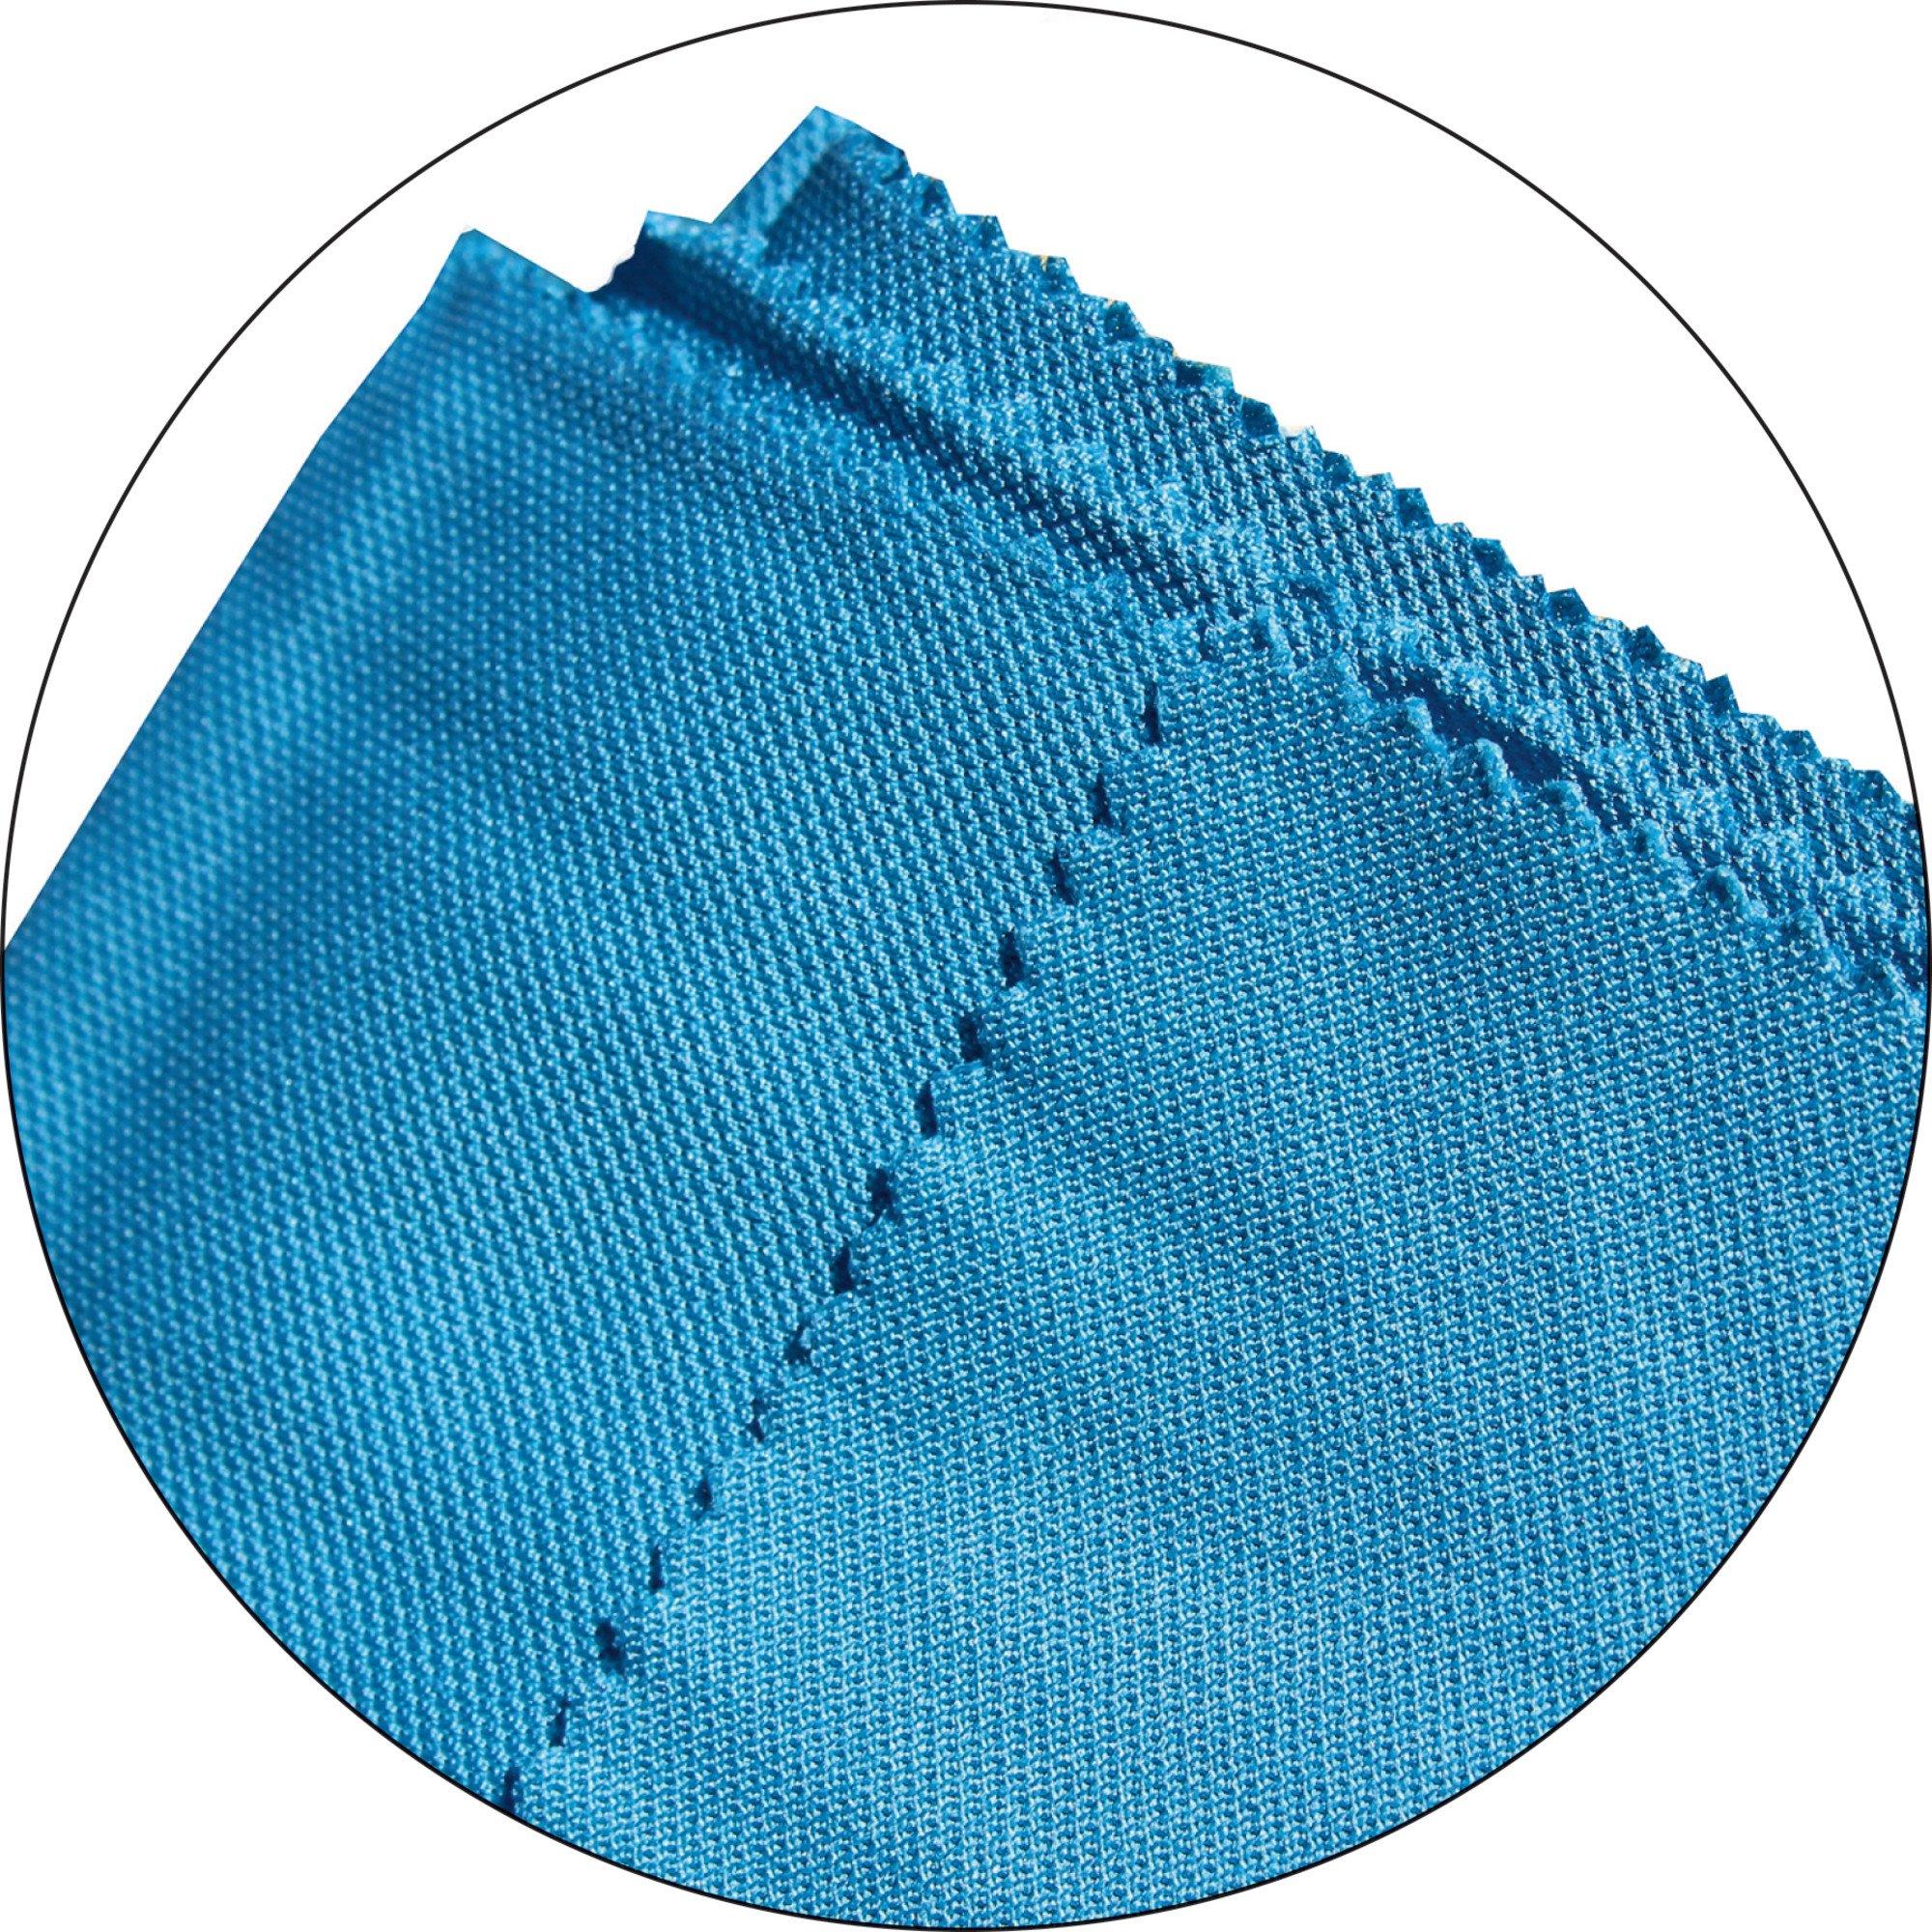 Glass & Polishing Cloth - Brilliant for Sparkling Windows, Mirrors, Glassware, Chrome, and More by E-Cloth (Image #4)